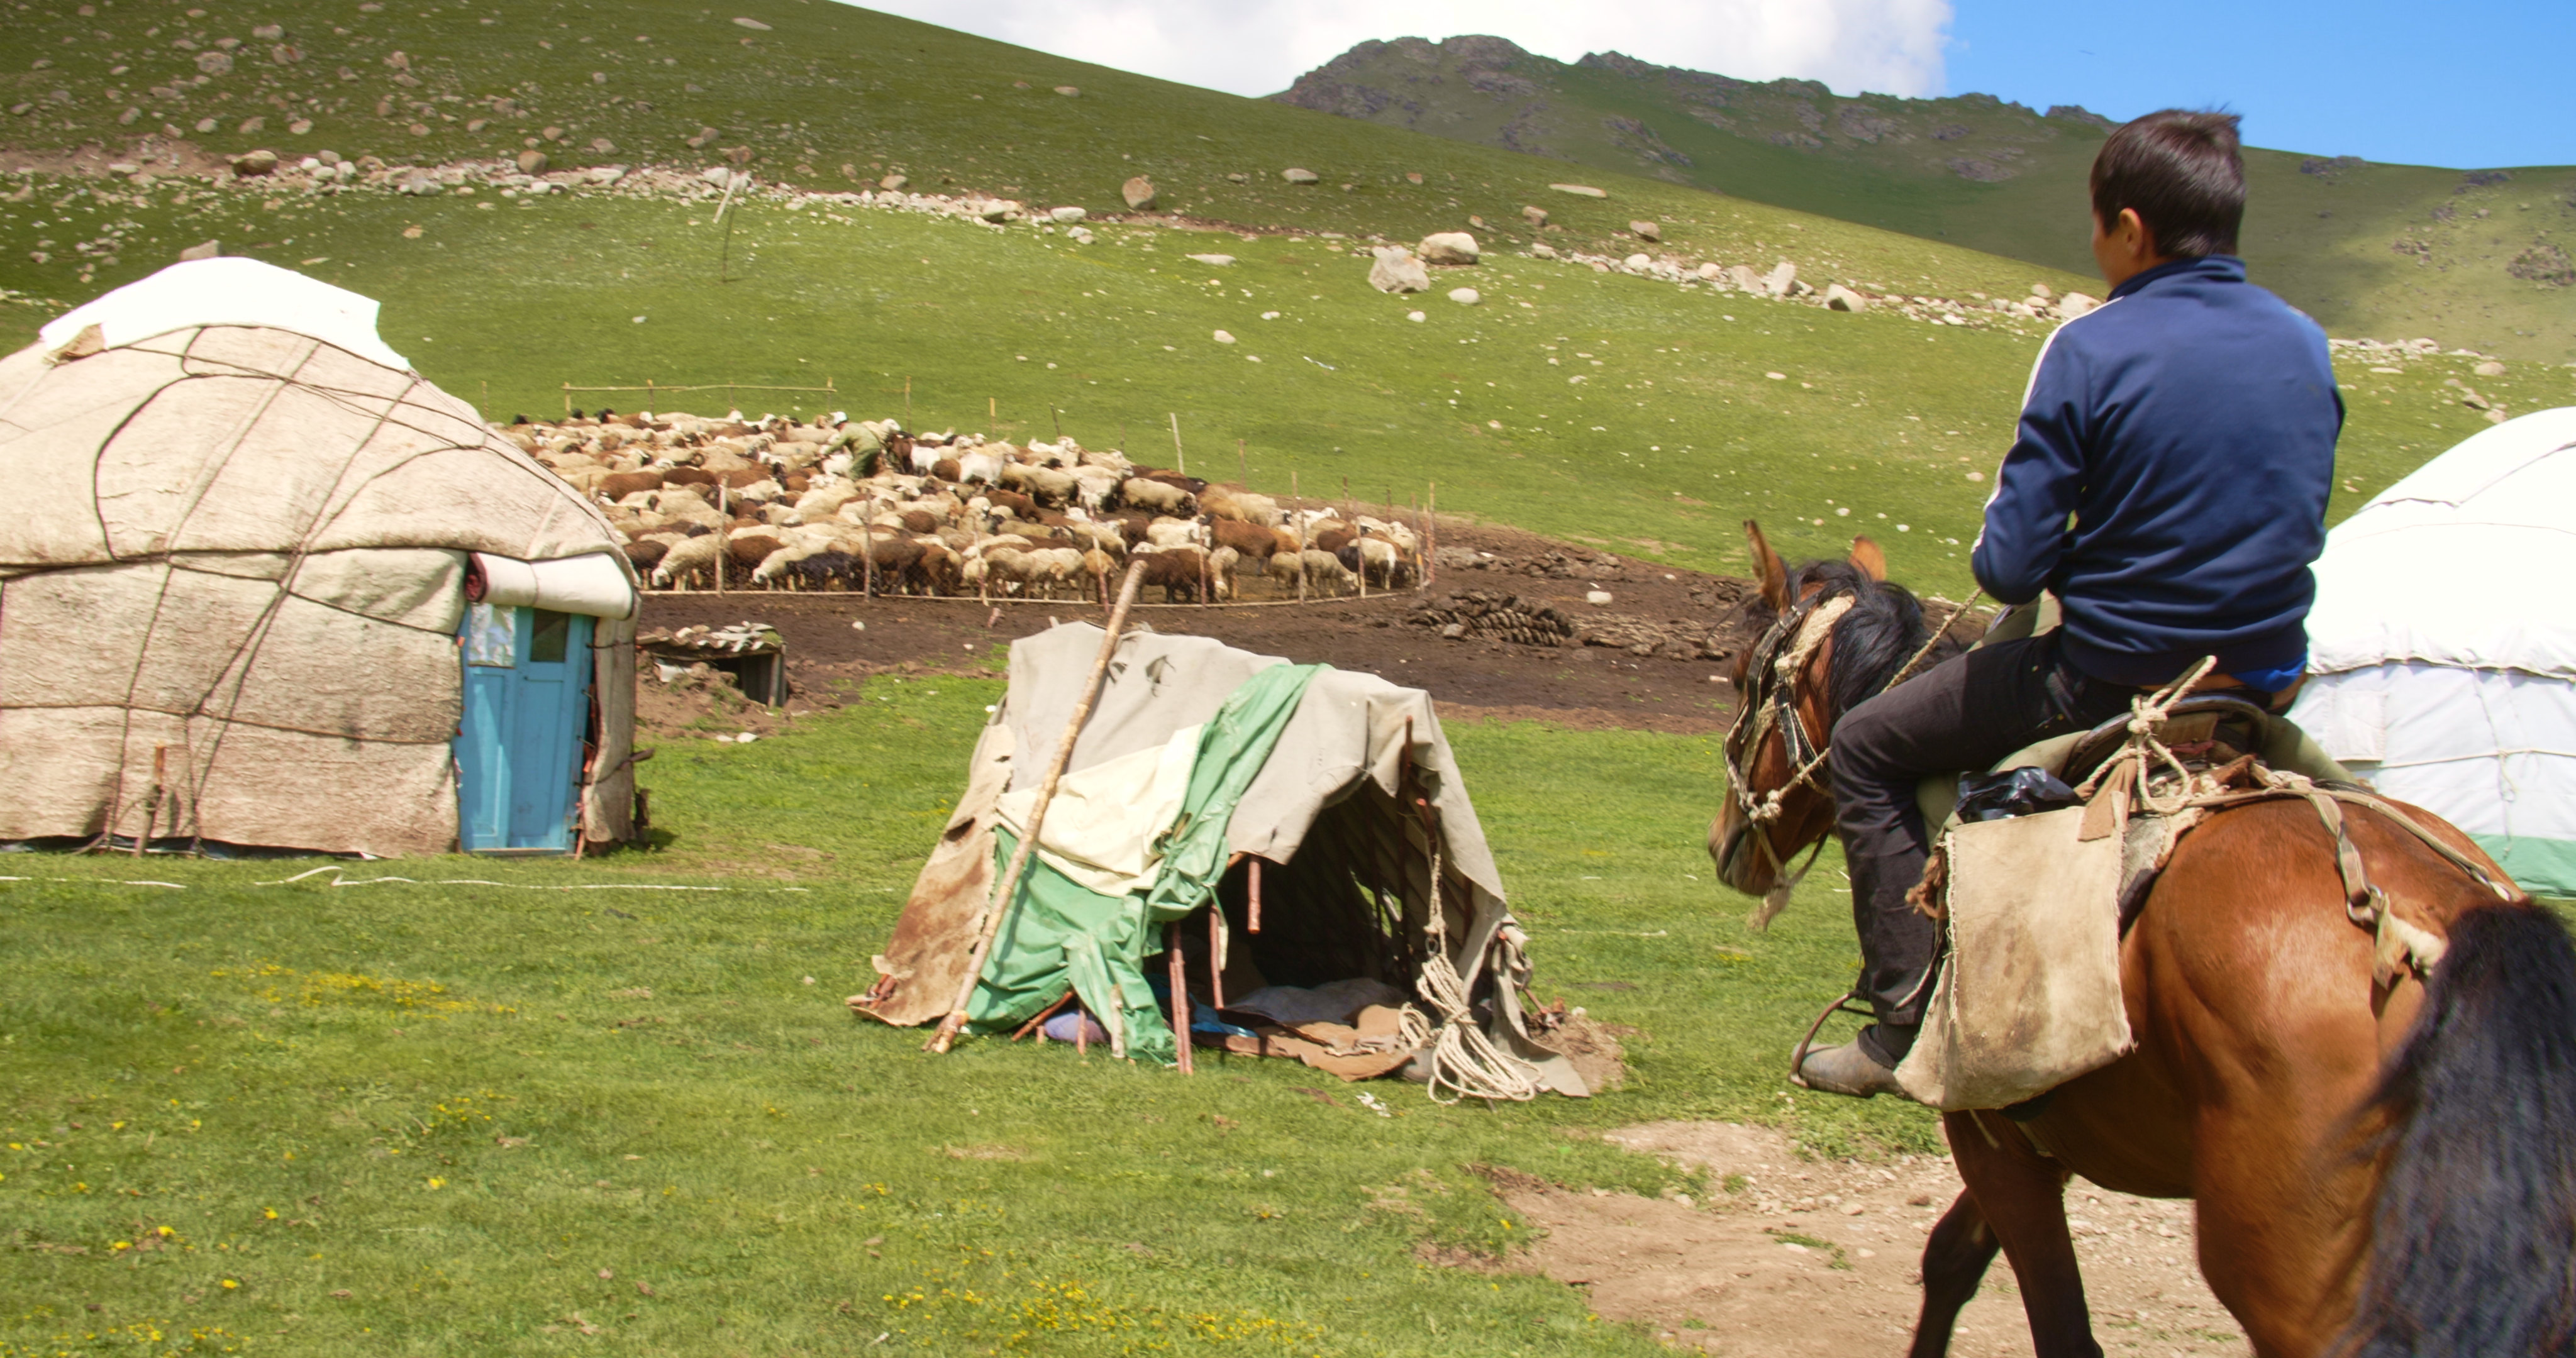 TheBoyFromKyrgyzstan_Stills_1.33.4